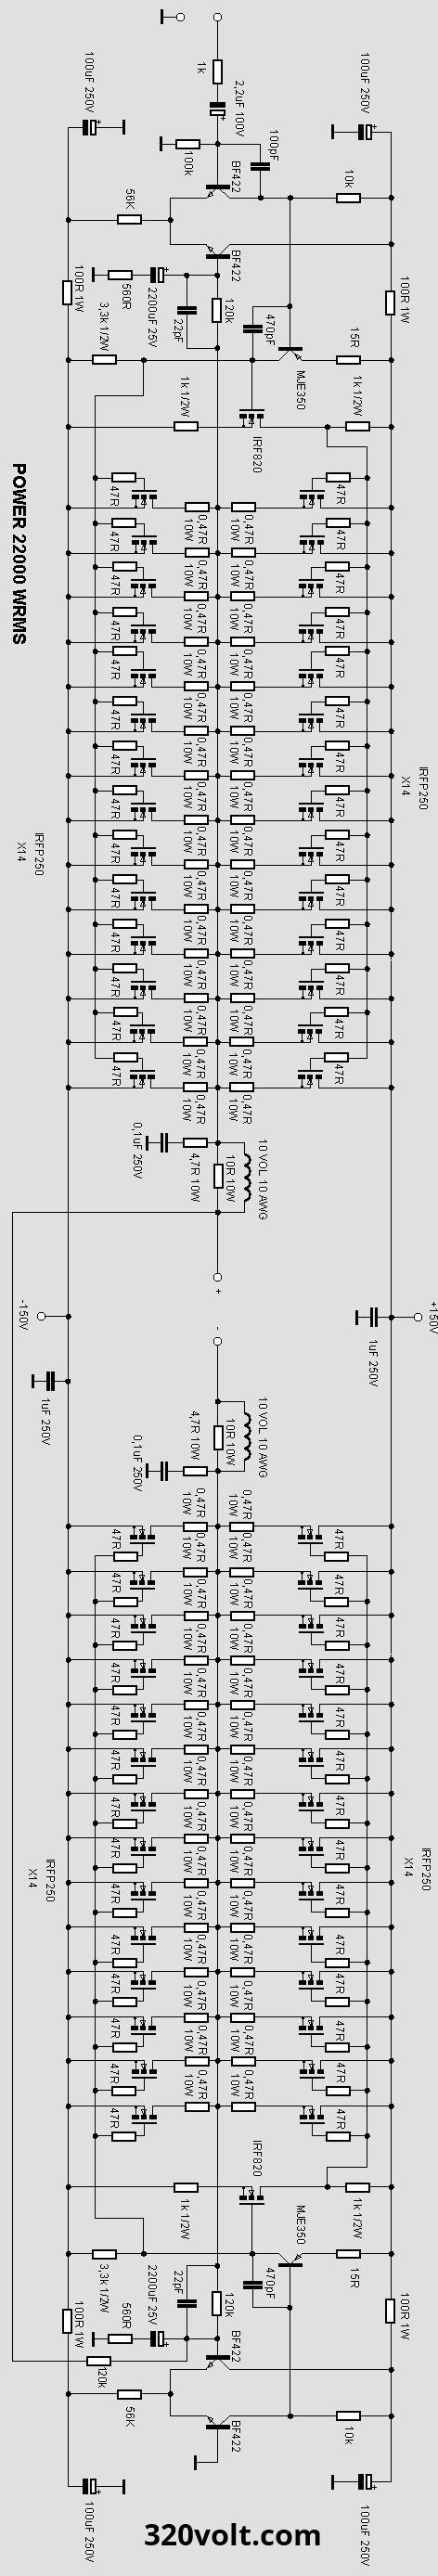 Nurul H Huda09977 On Pinterest Transistor Amplifiers